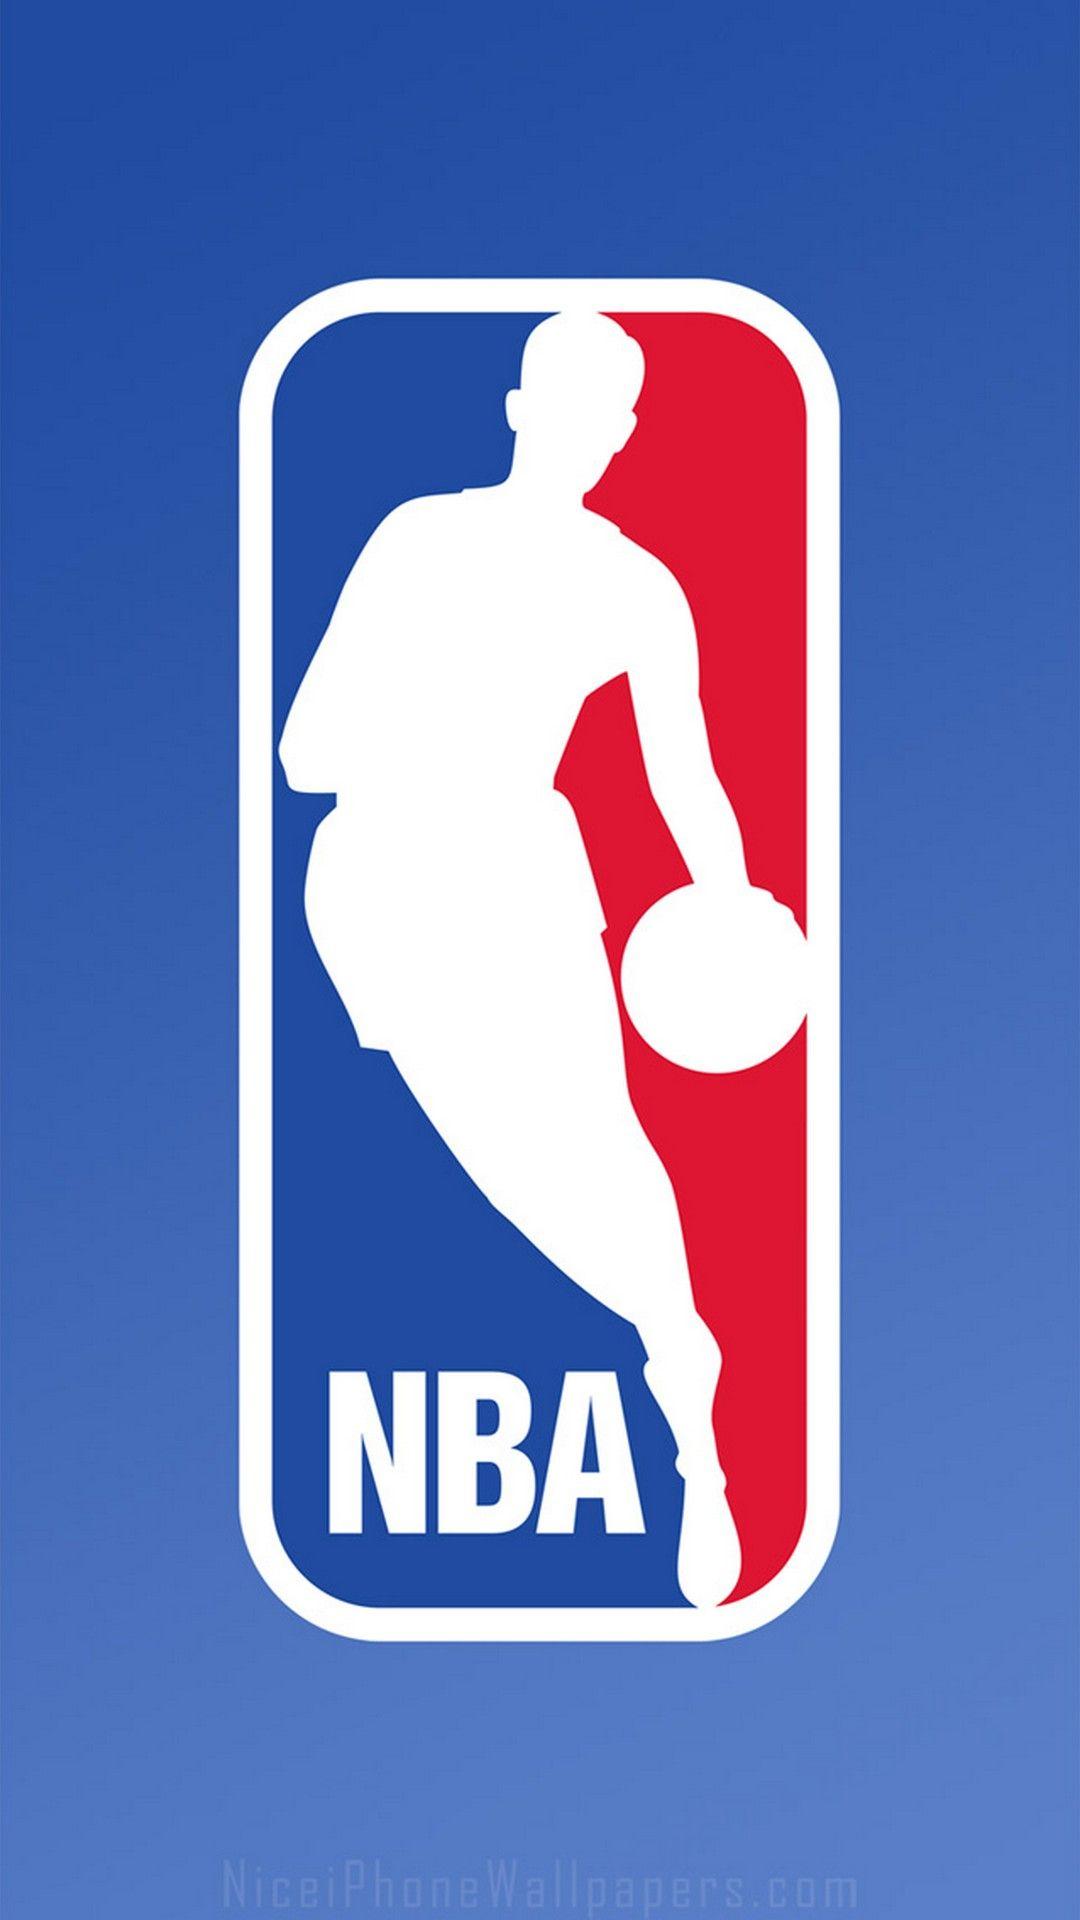 Nba Mobile Wallpaper Hd 2020 Basketball Wallpaper Nba Wallpapers Basketball Wallpaper Basketball Wallpapers Hd